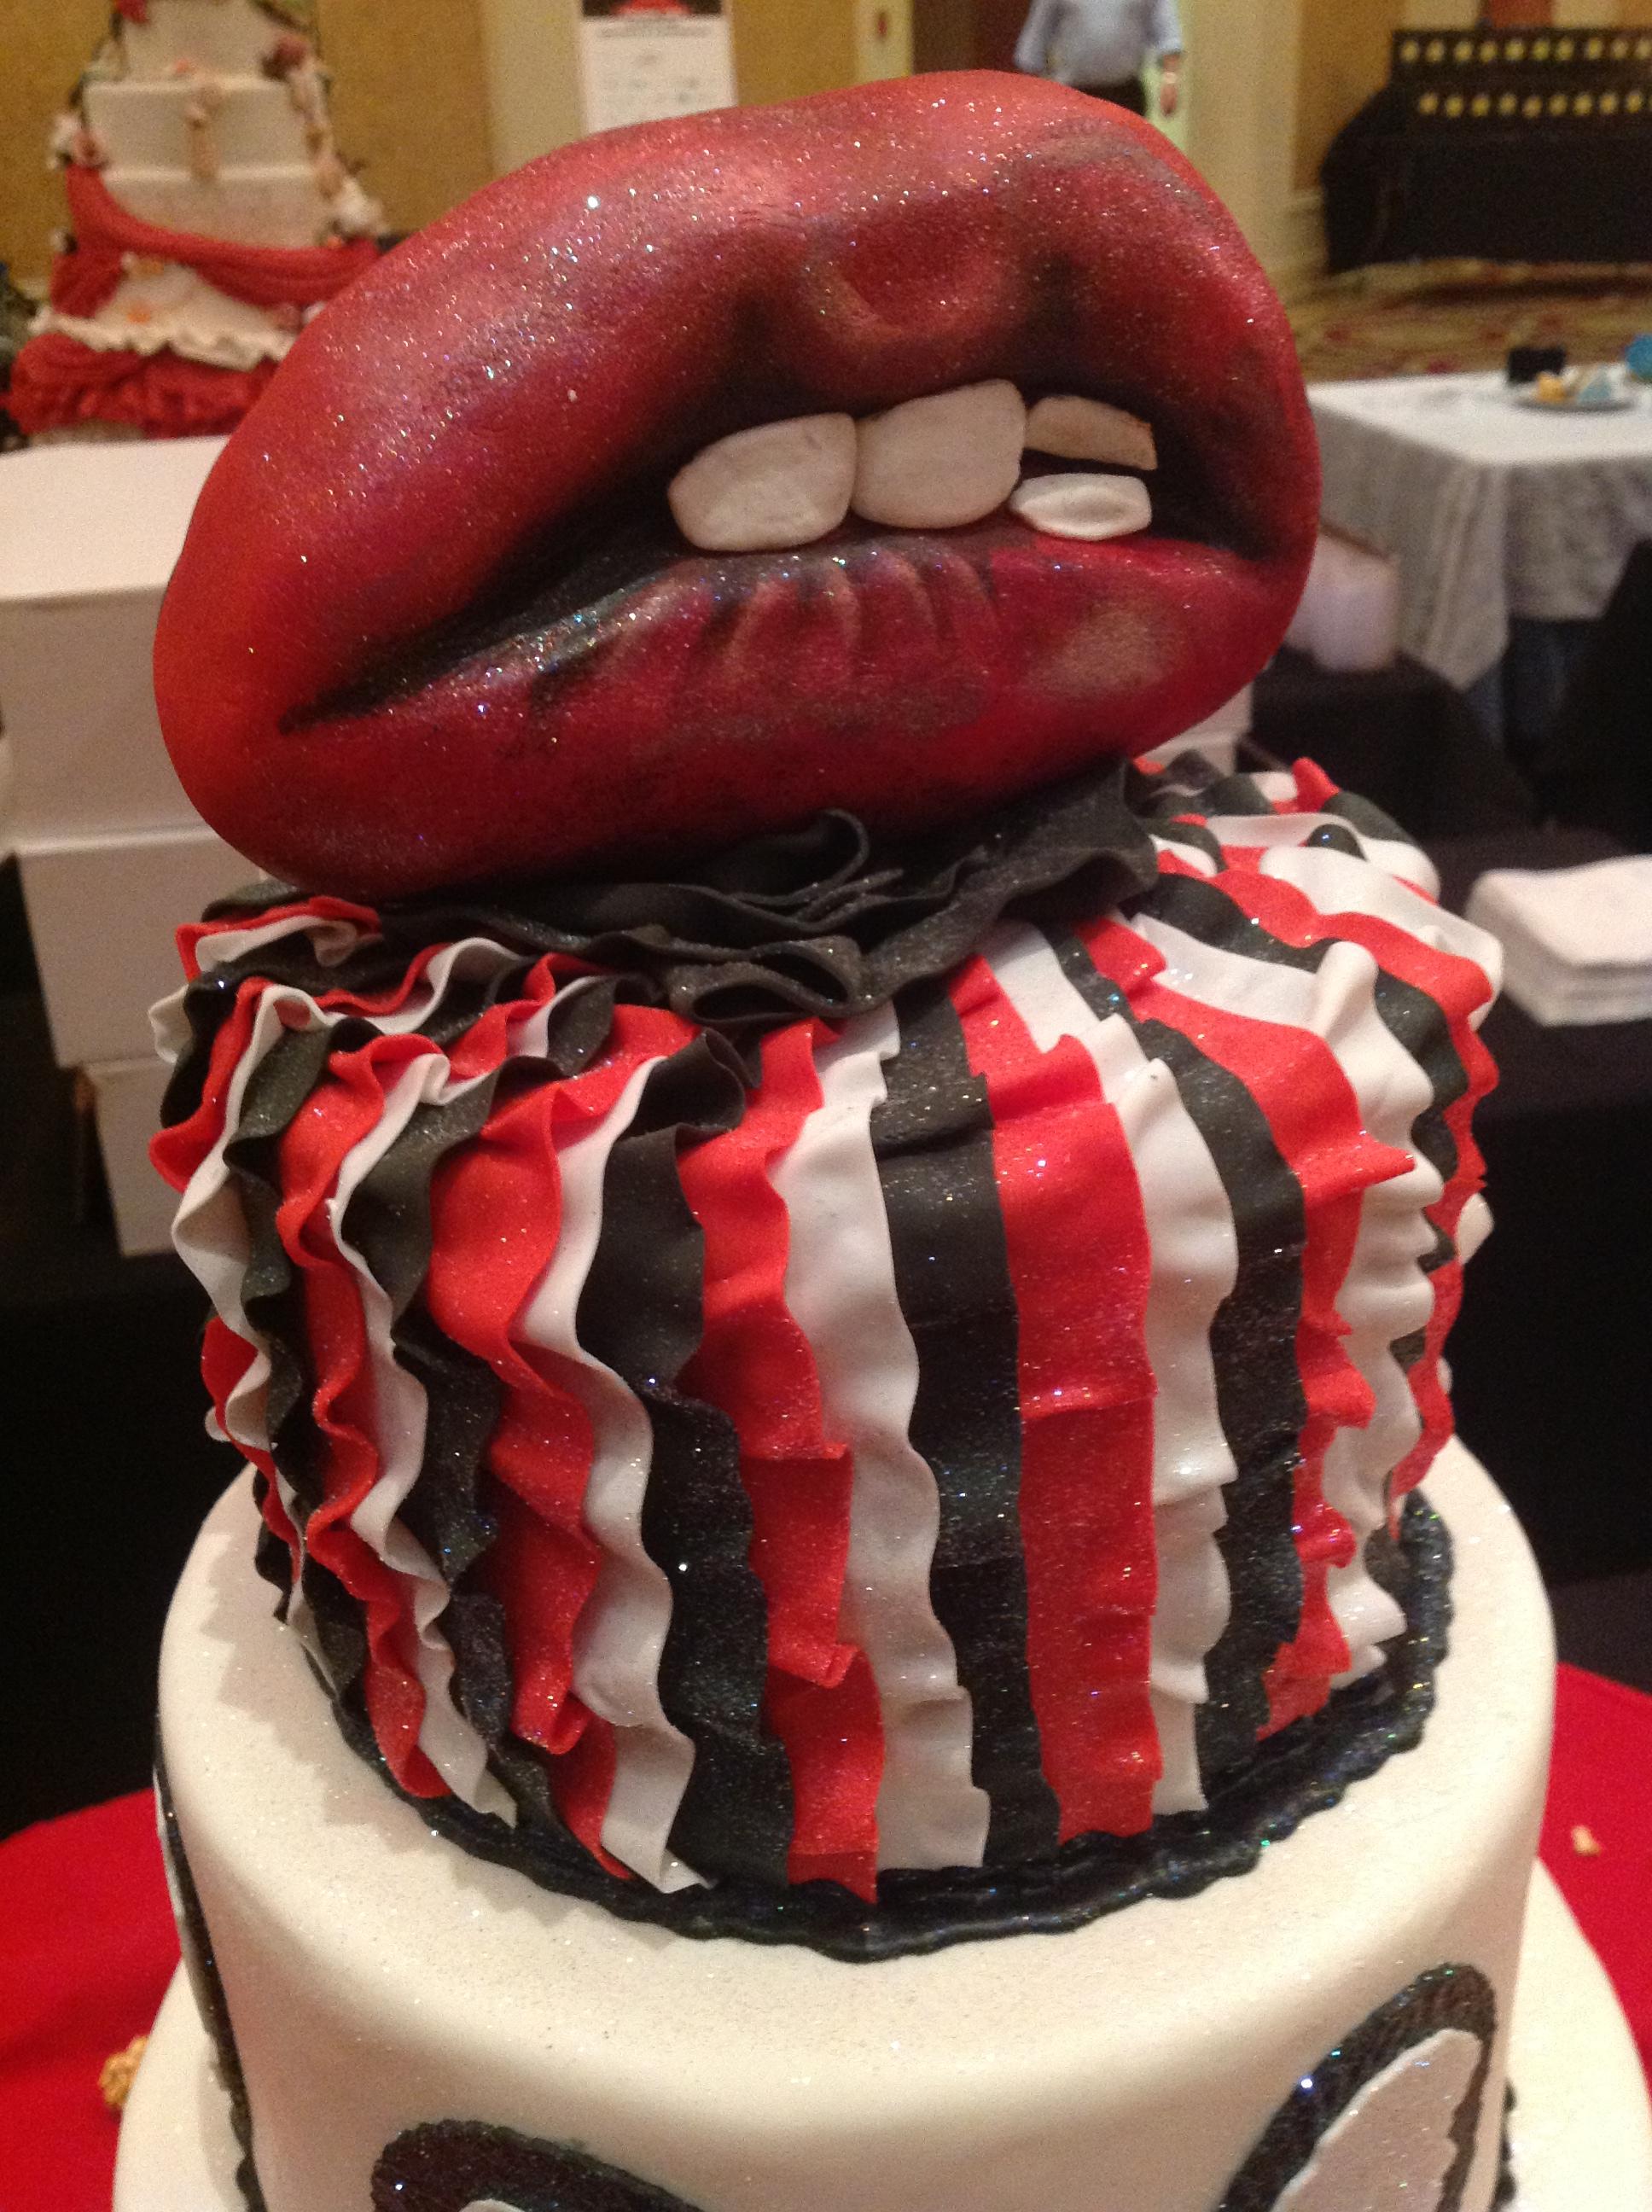 Let Them Eat Cake, City of Hope, Fantasy Weddings, Free Cupcakes